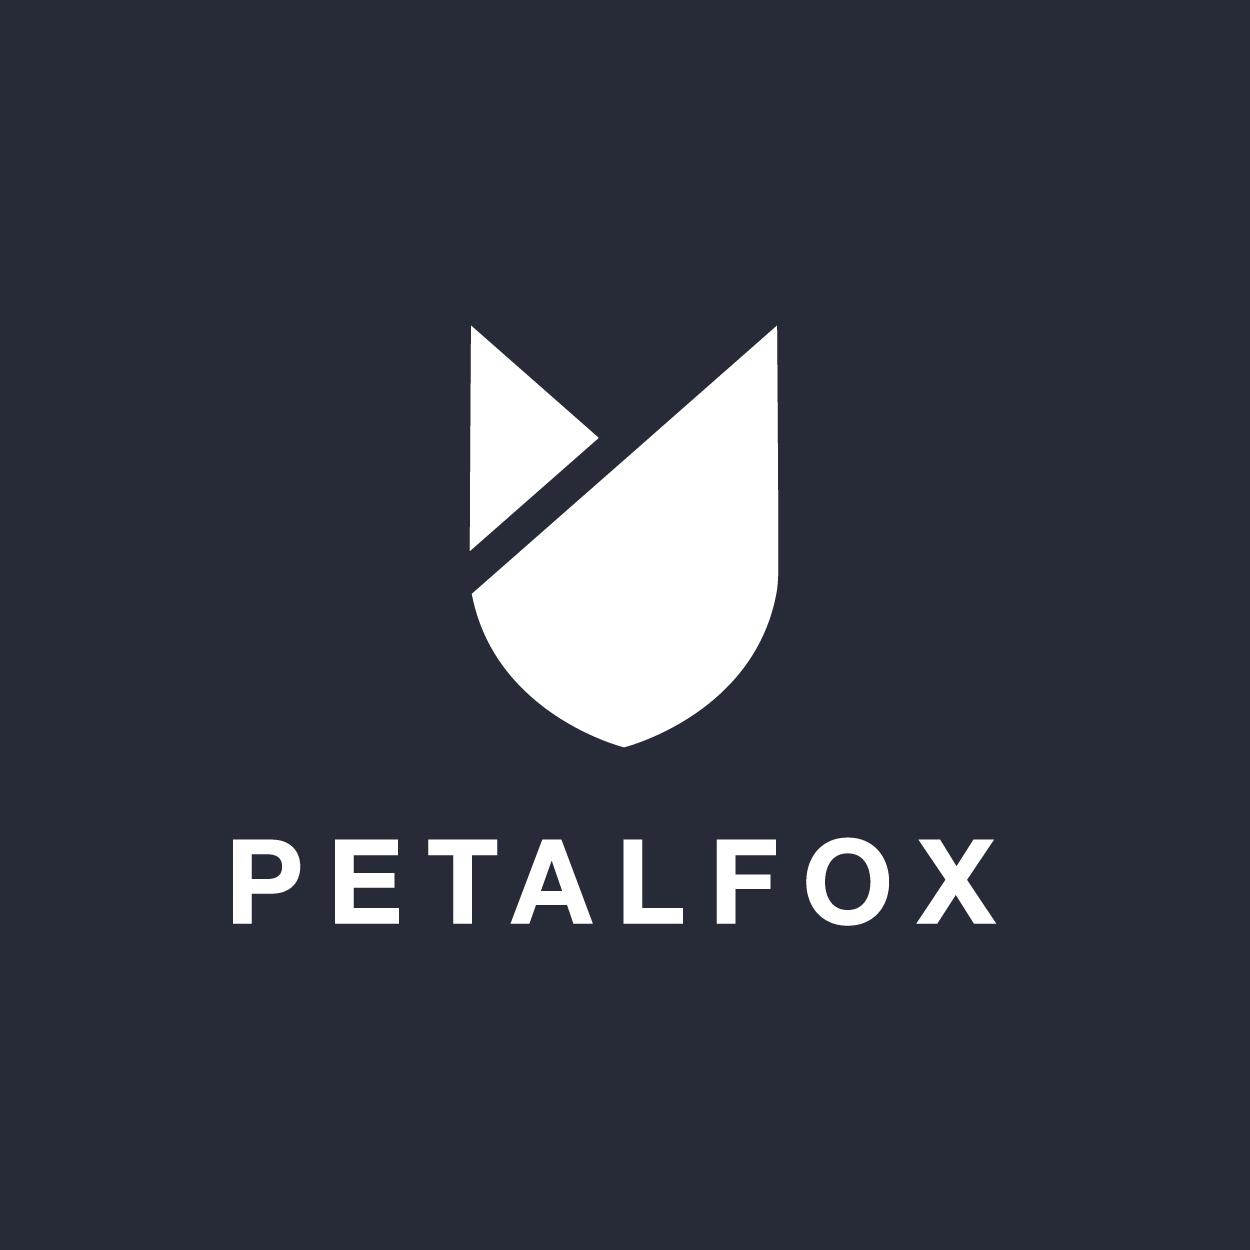 Petalfox_Square_Logo_Lockup_1_DarkonWhite 2.png